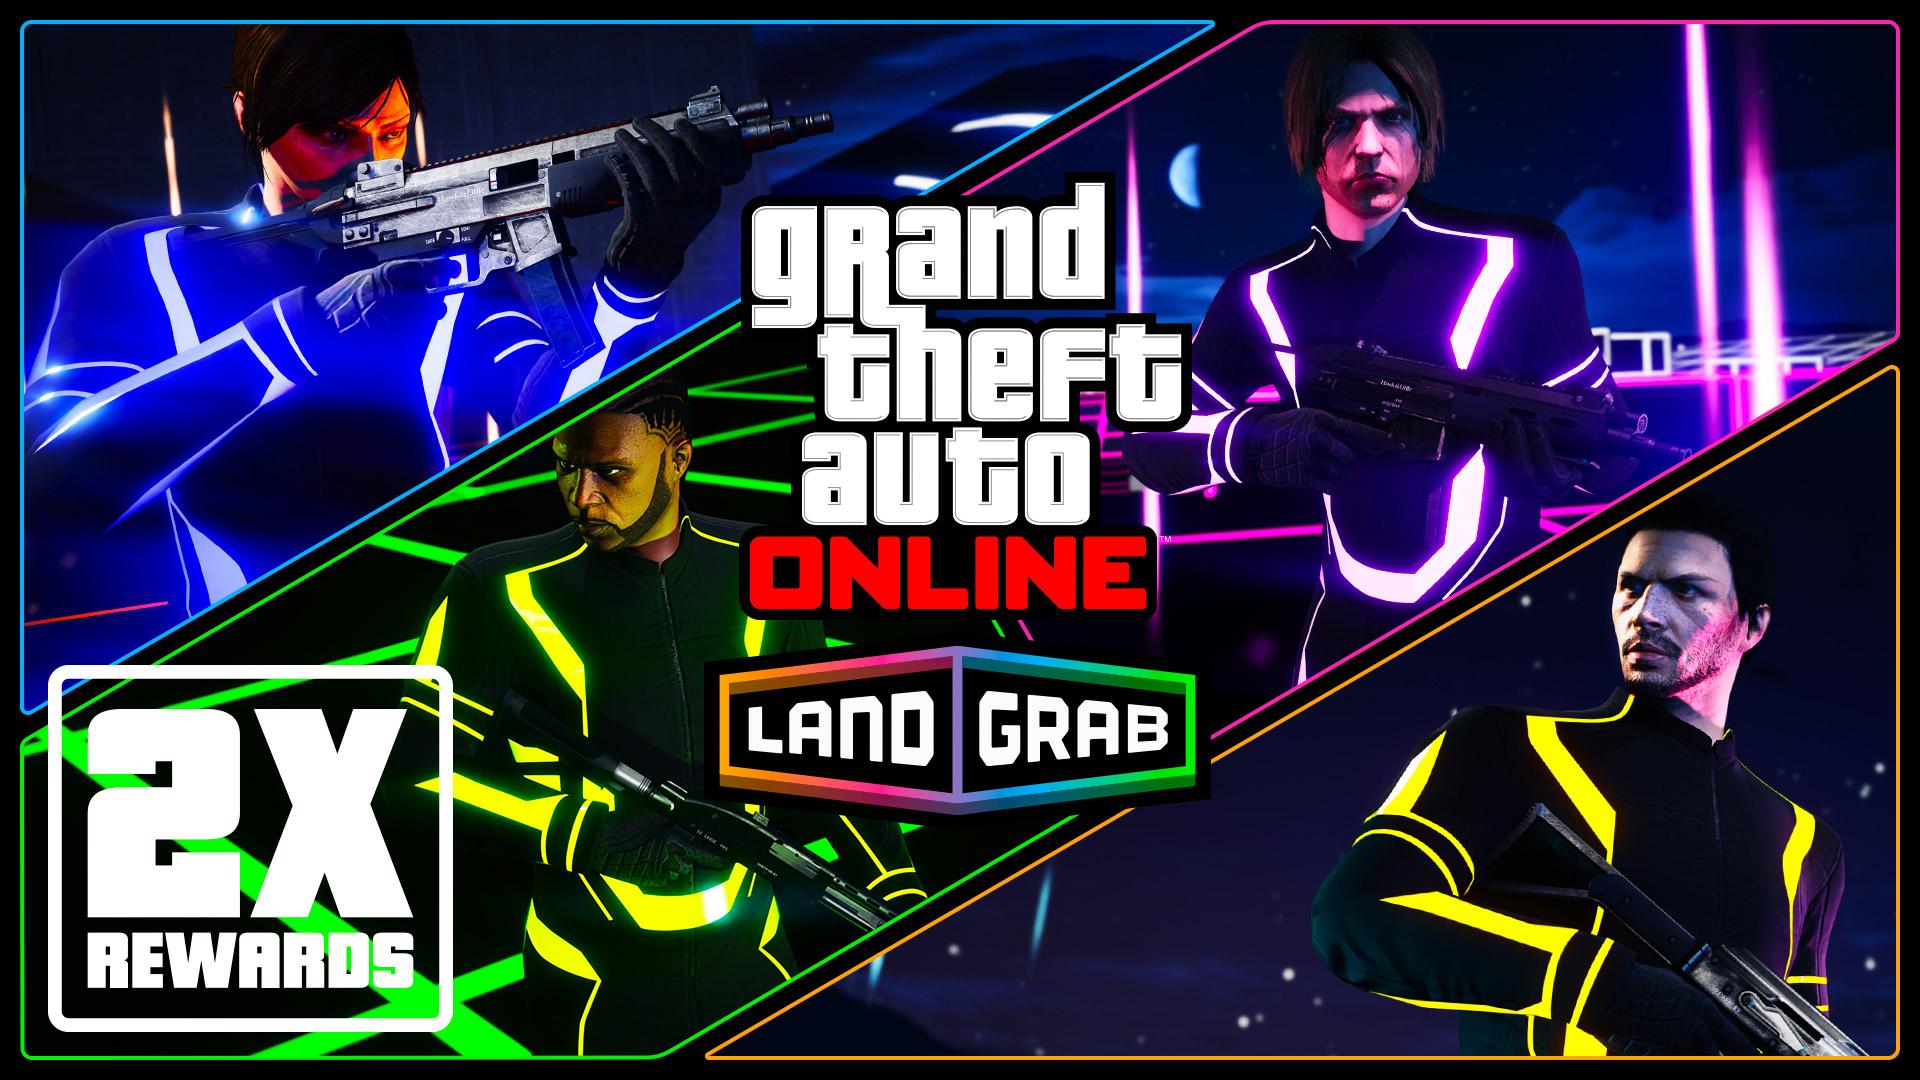 GTA Online Land Grab